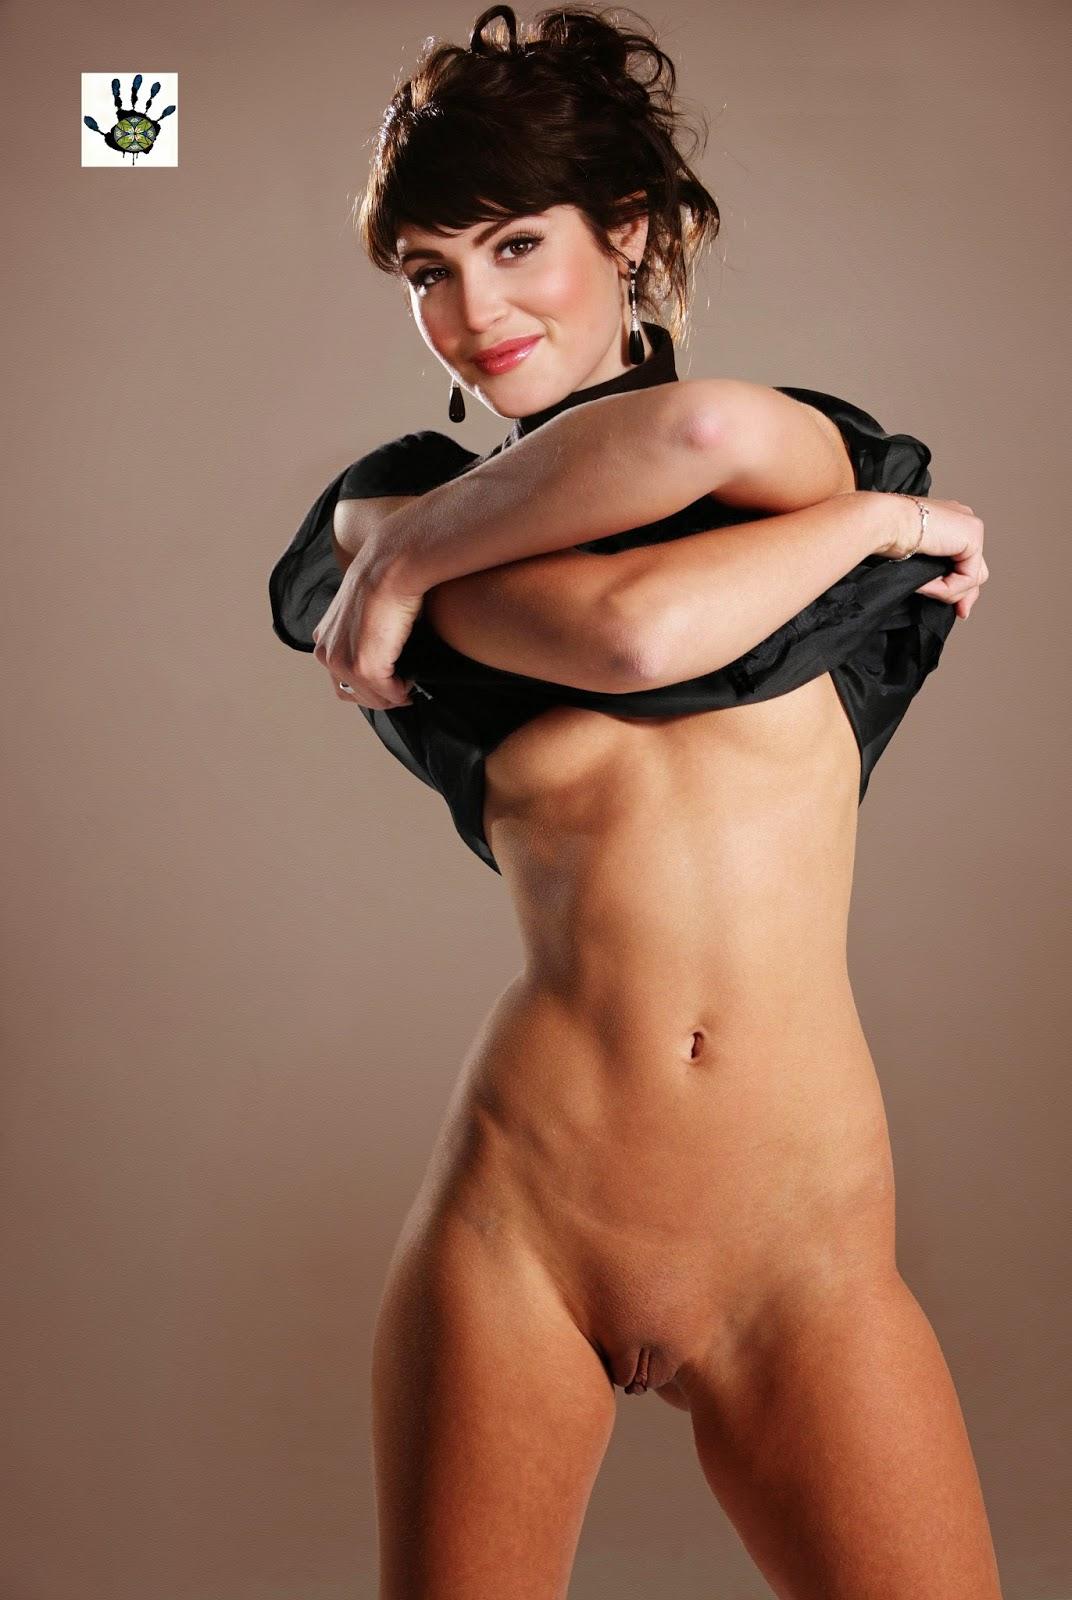 nude fakes arterton Gemma